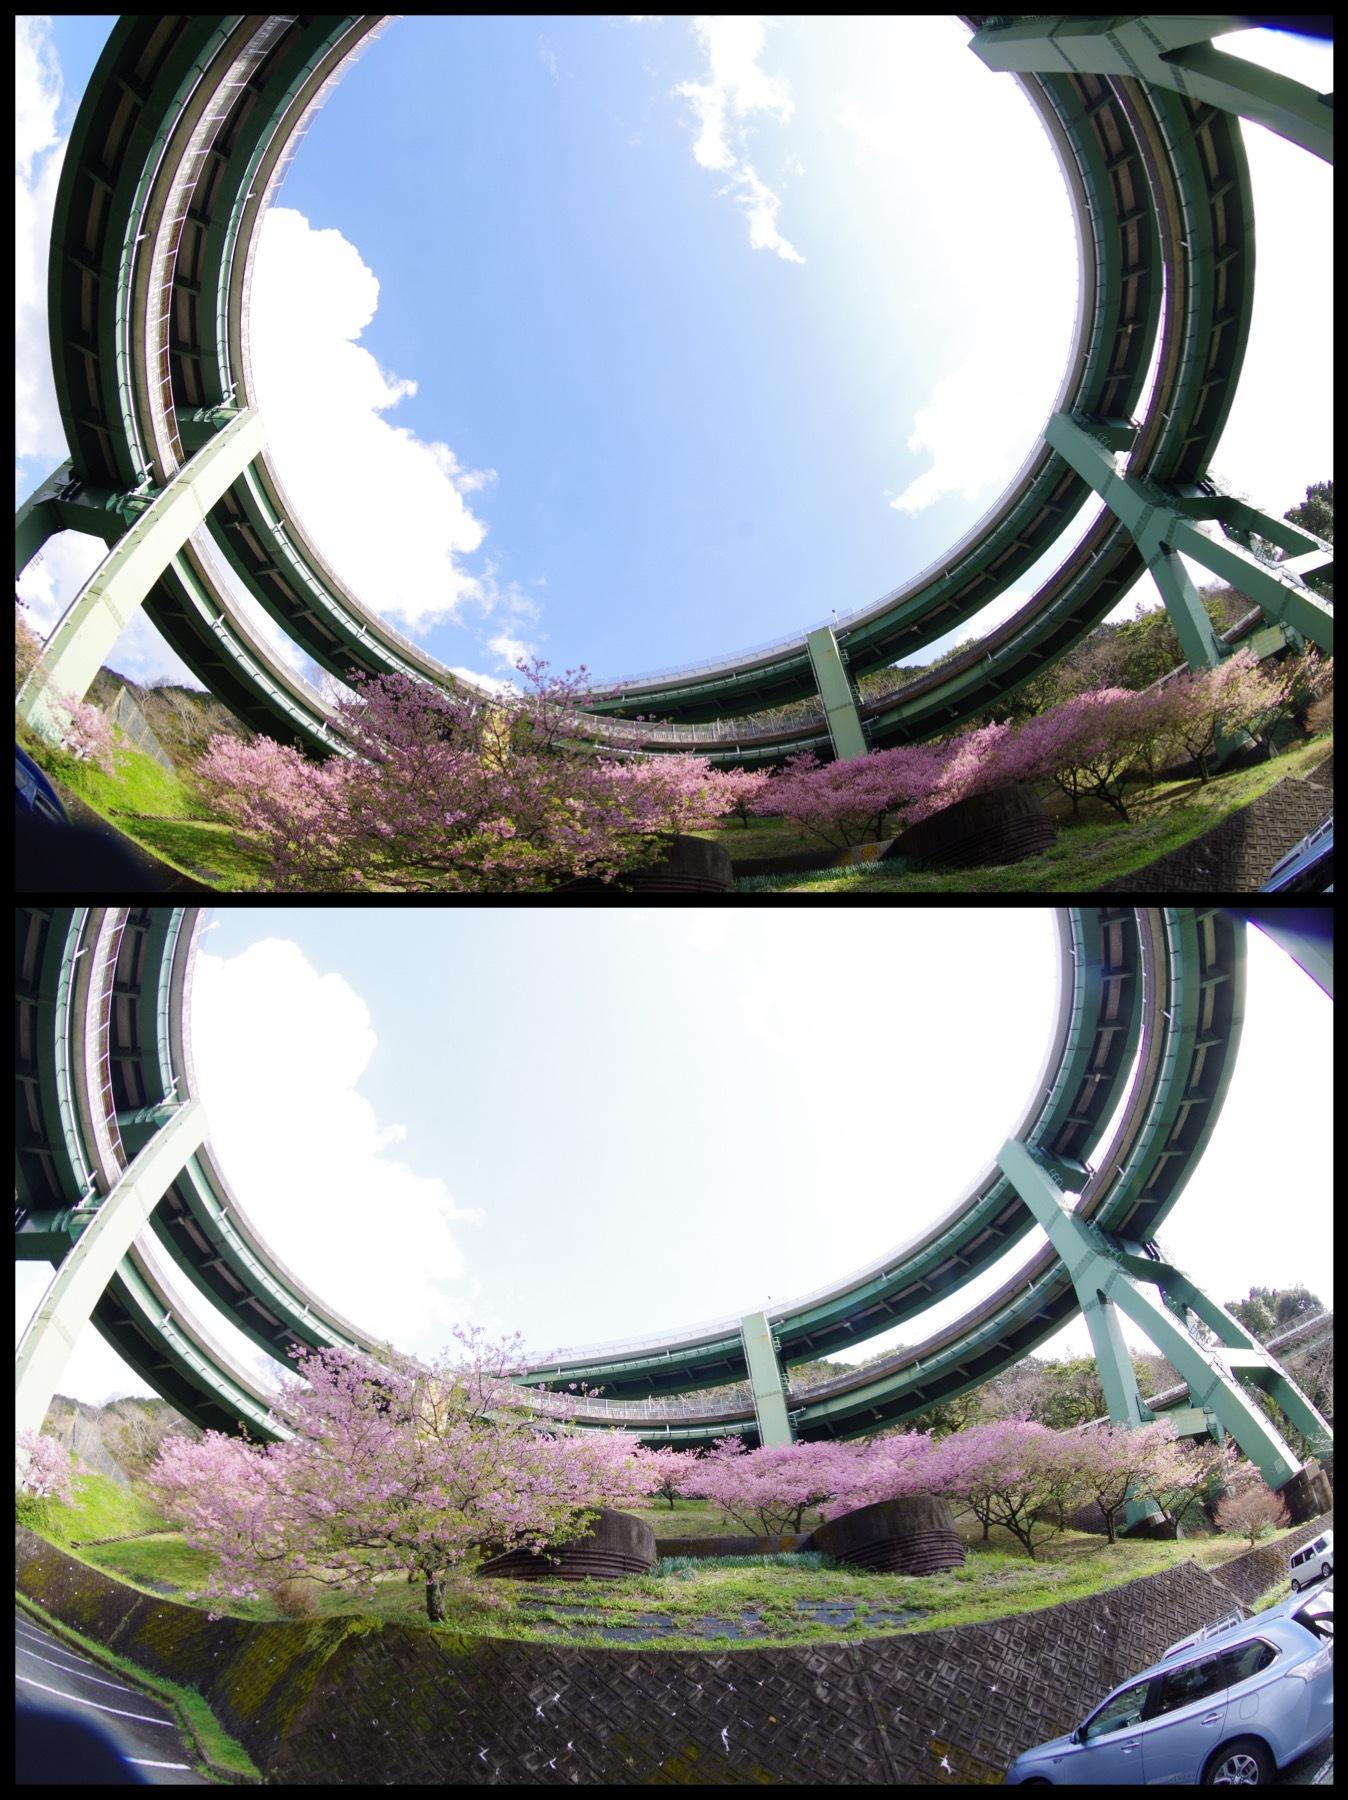 河津桜祭り2020 伊豆河津町  七滝ループ橋